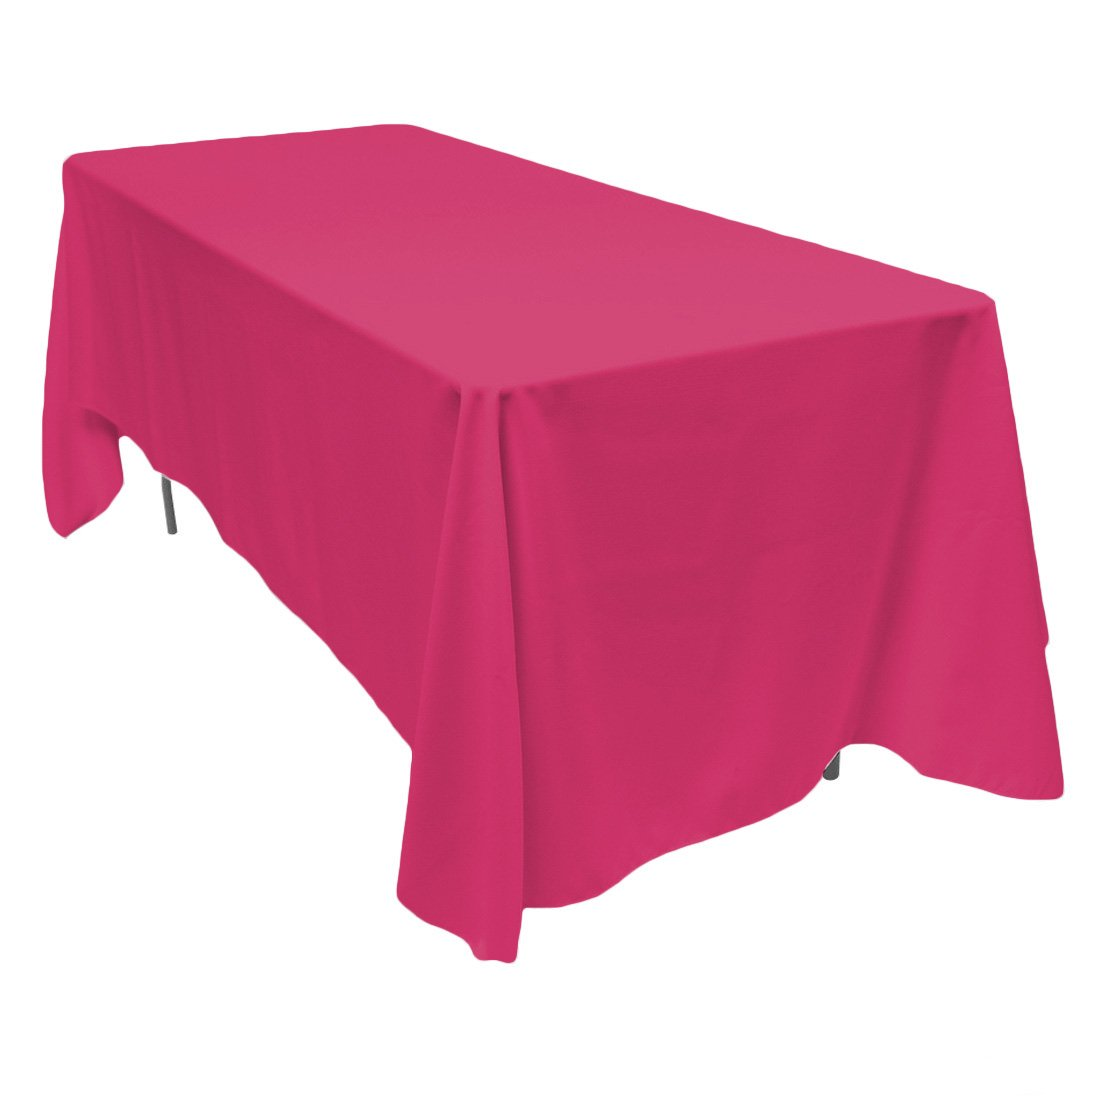 Amazon.com: LinenTablecloth 70 X 120 Inch Rectangular Polyester Tablecloth  Fuchsia: Home U0026 Kitchen